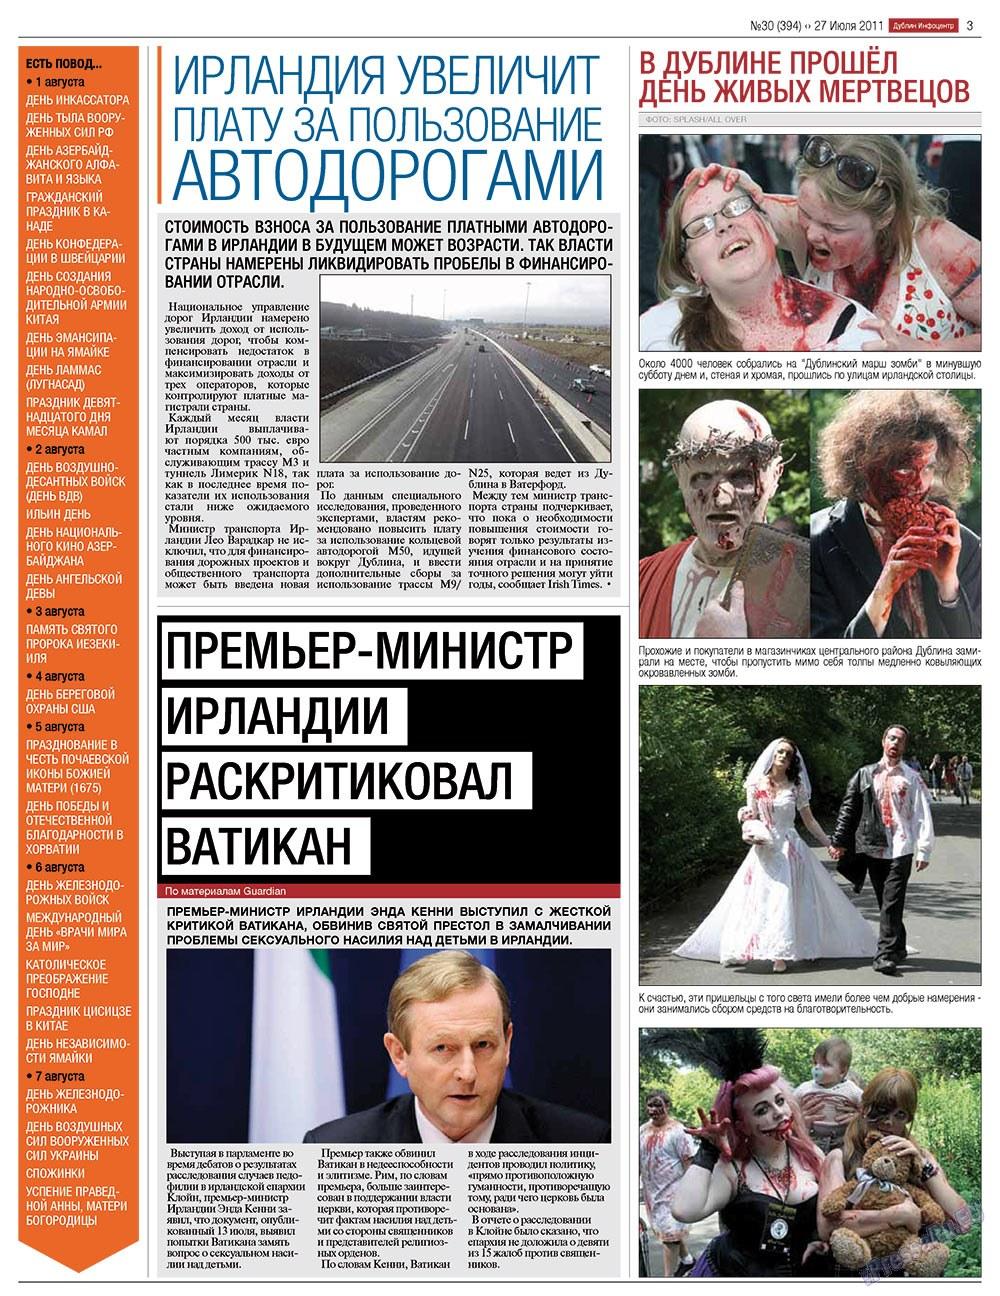 Дублин инфоцентр (газета). 2011 год, номер 30, стр. 3